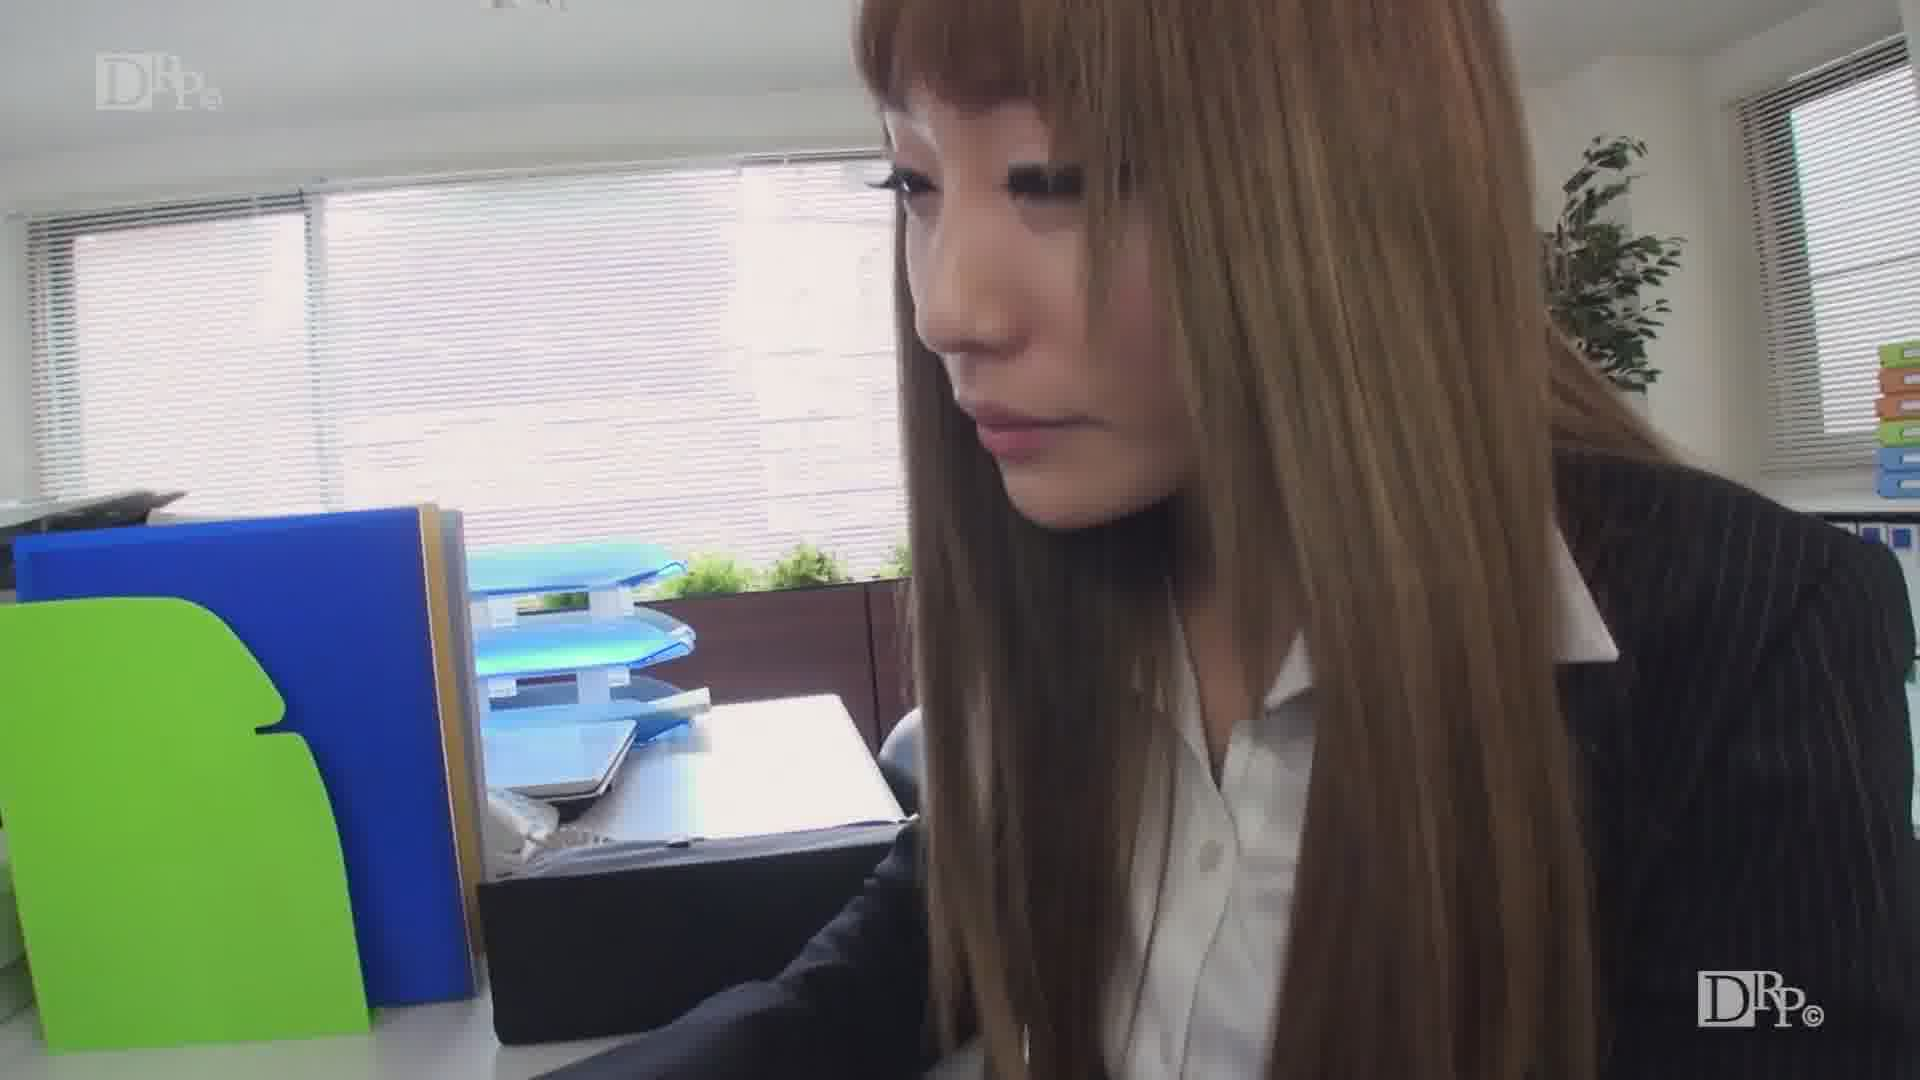 OLの尻に埋もれたい Vol.8 - 真白愛梨【ギャル・パイパン・OL】